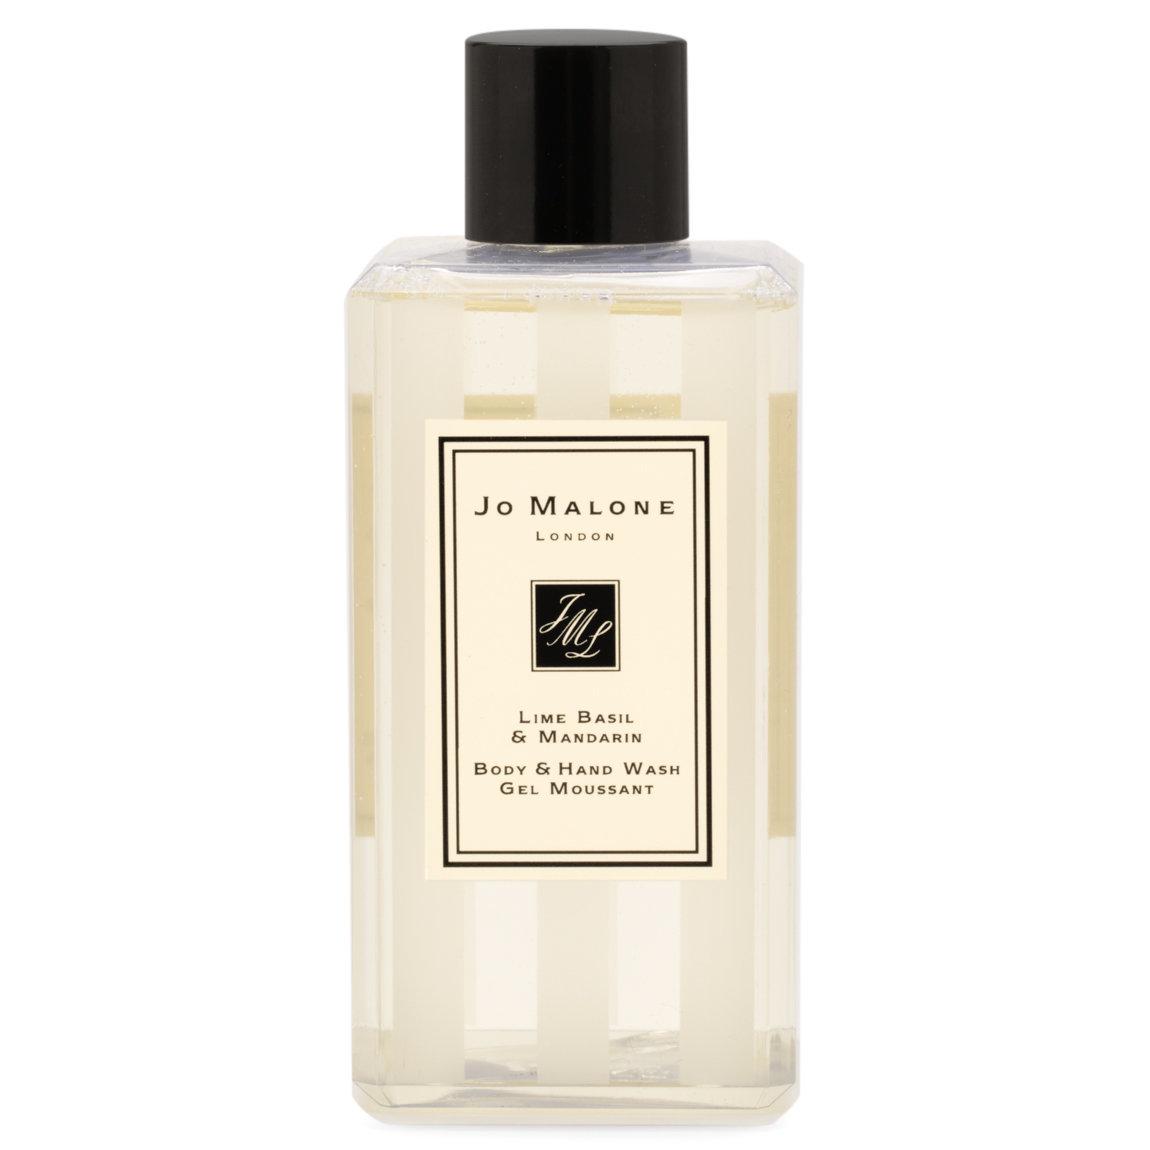 Jo Malone London Lime Basil & Mandarin Body & Hand Wash 100 ml product swatch.